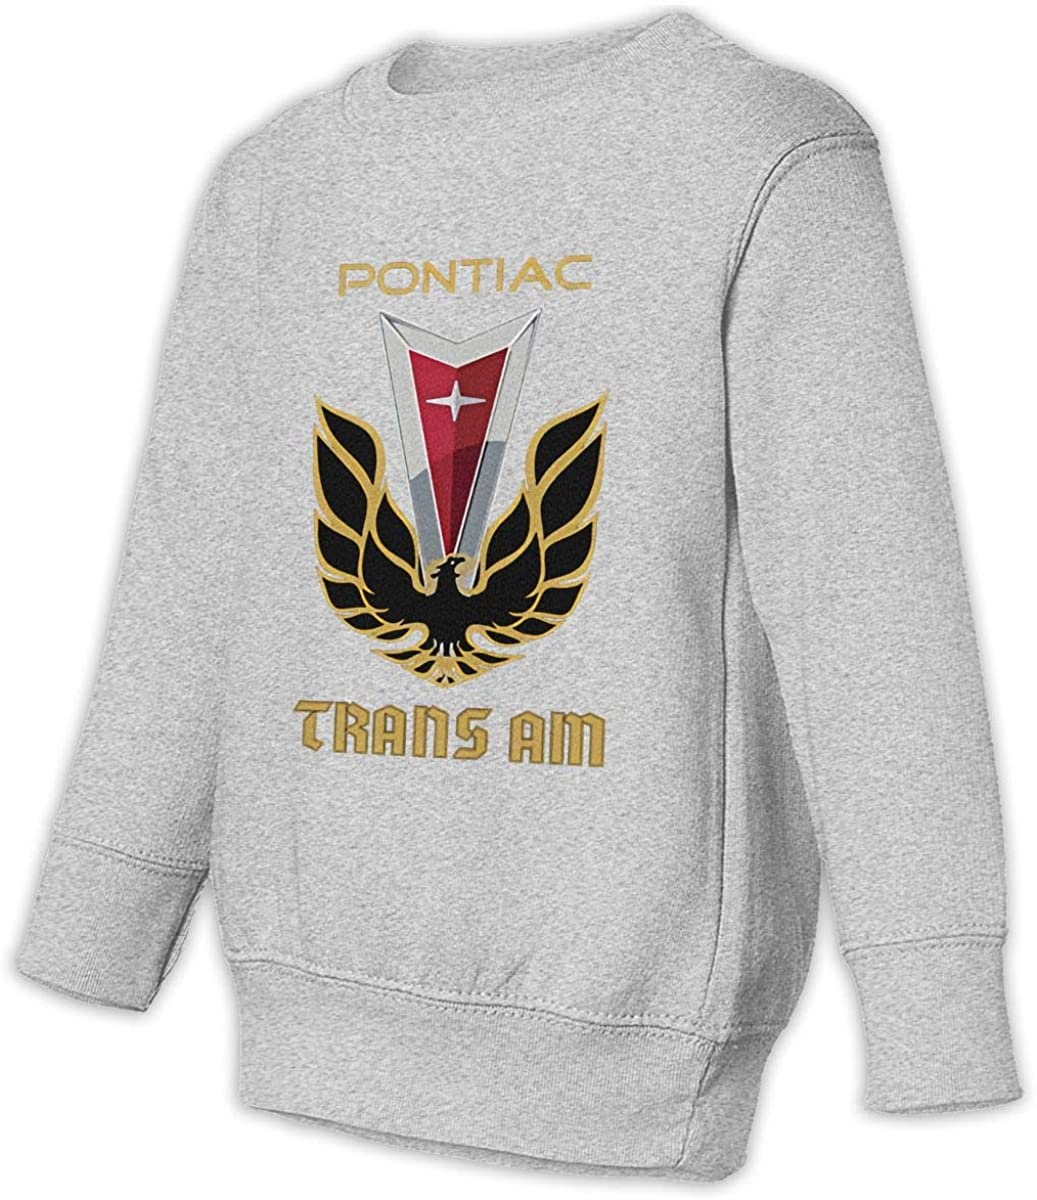 1836 Pontiac Trans Am Unisex Sweatshirt Youth Boy and Girls Pullover Sweatshirt 3t Gray